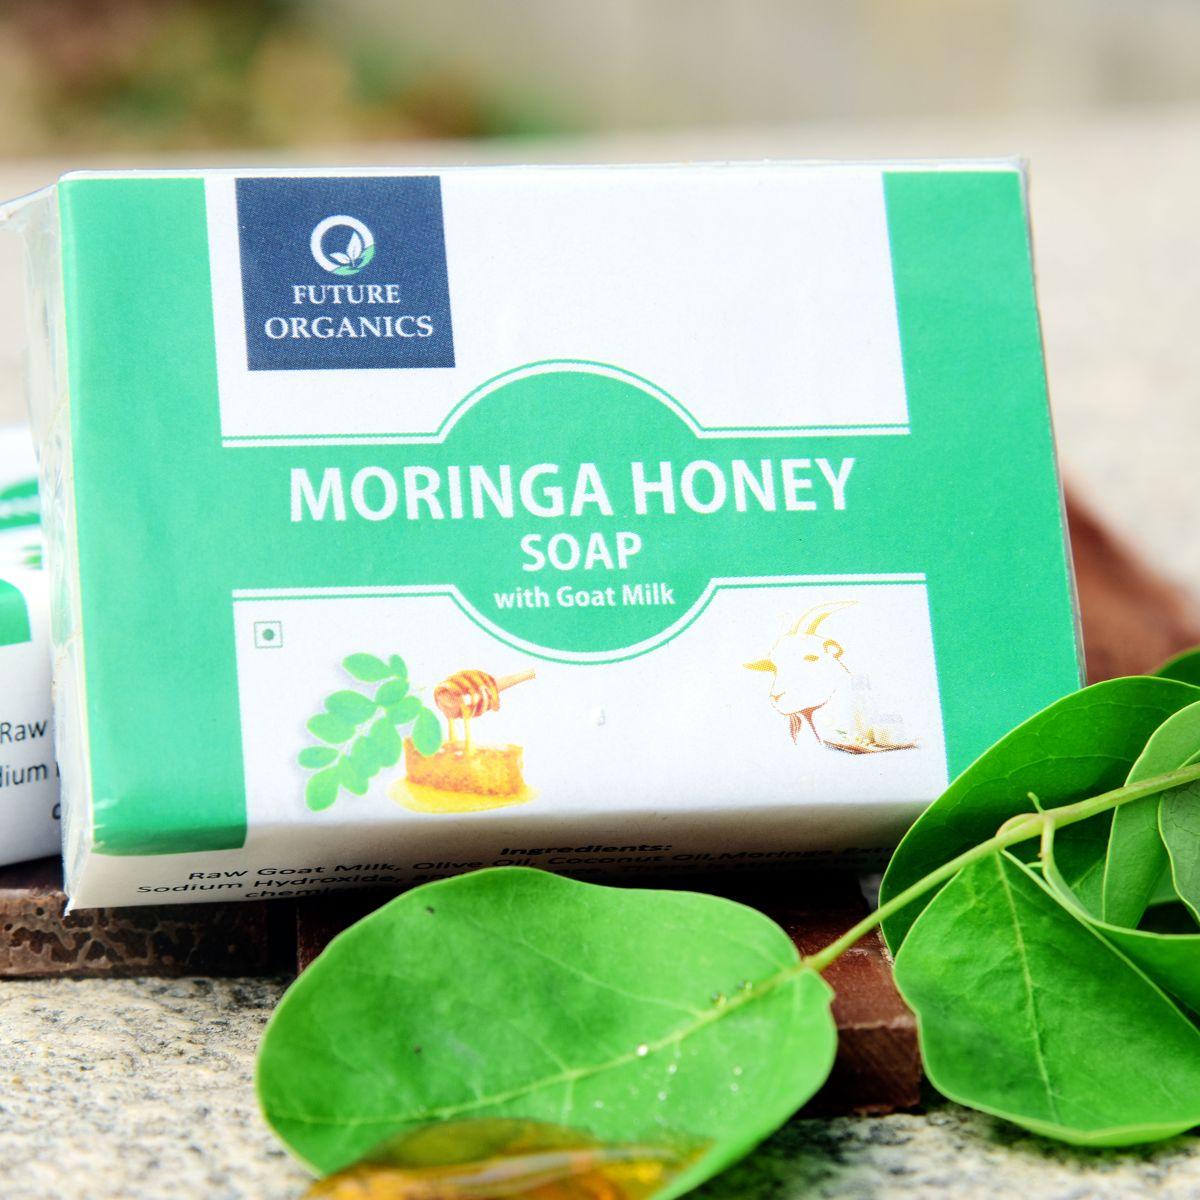 MORINGA HONEY SOAP(set of 2)